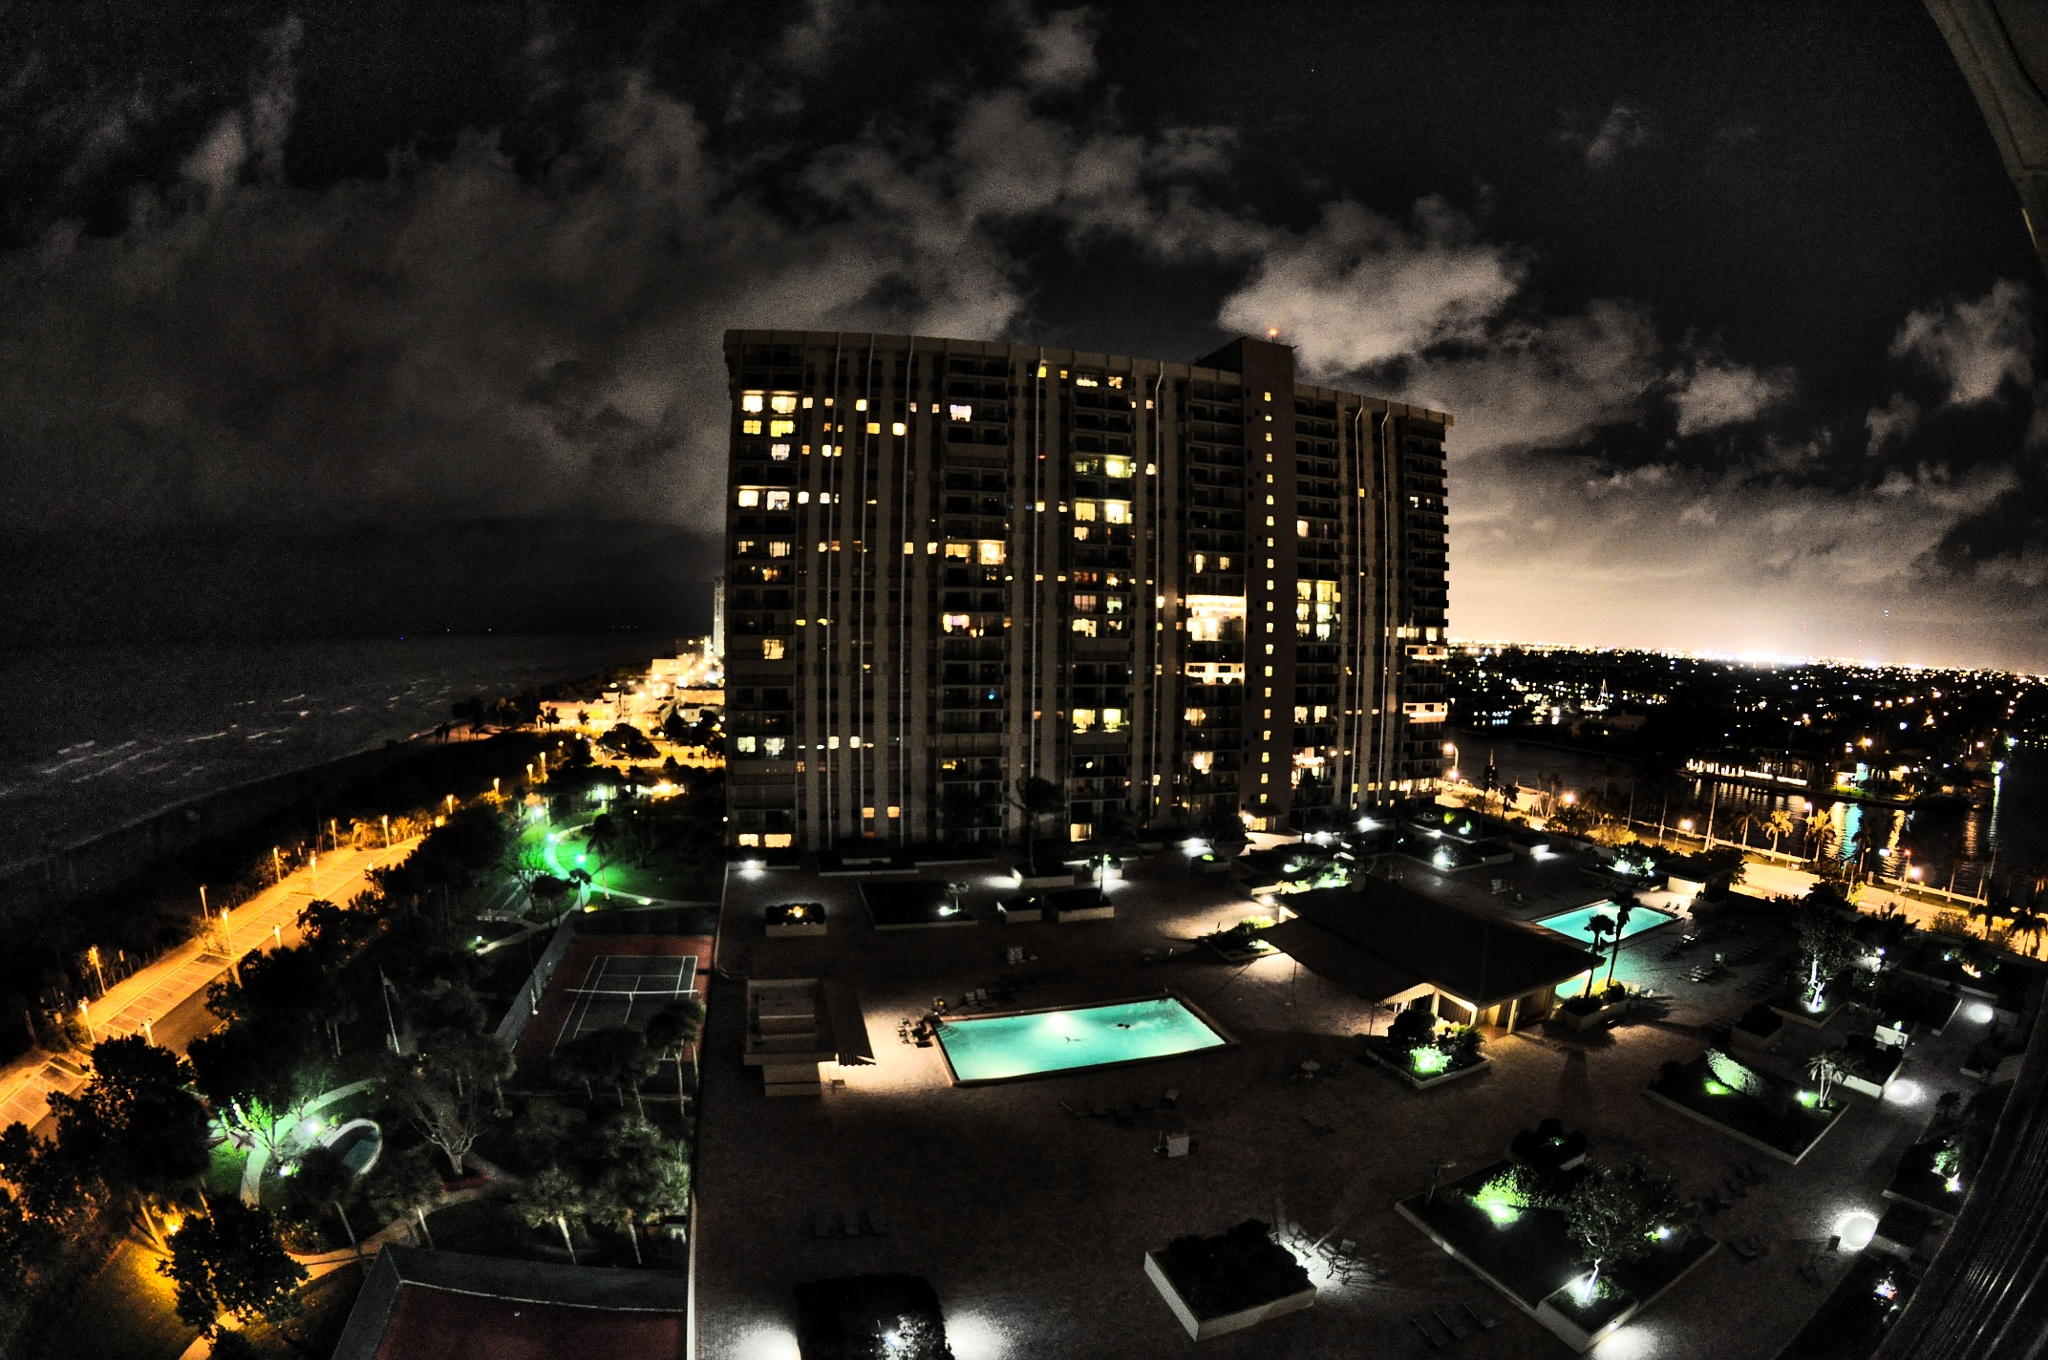 Florida At Night by Fotoguy